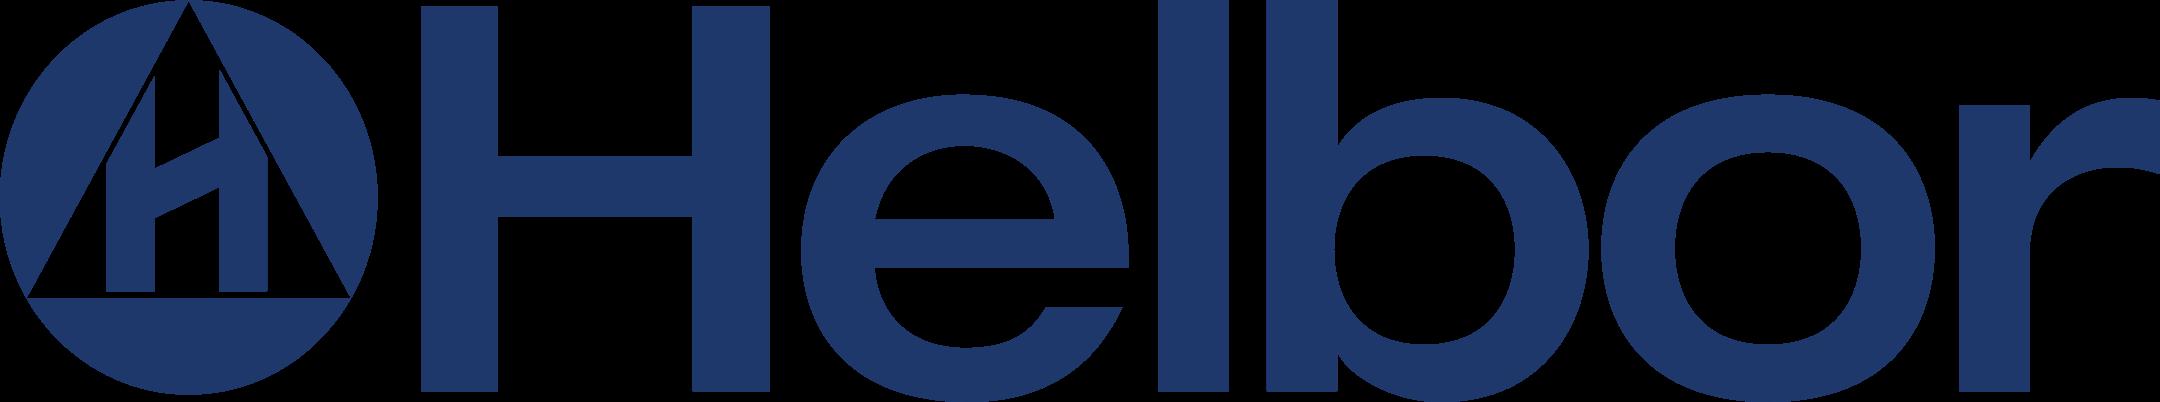 helbor logo 2 - Helbor Logo